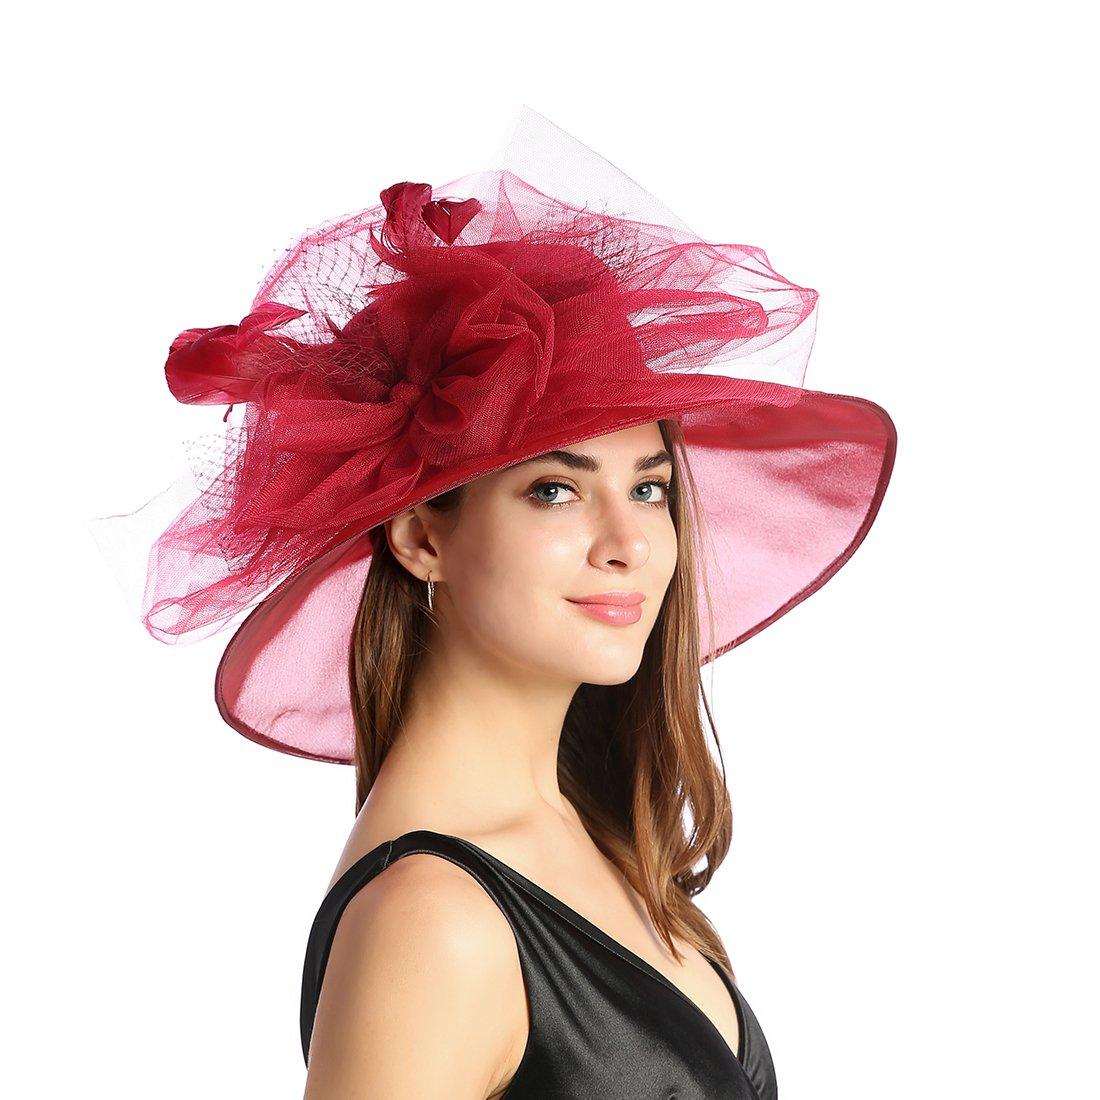 Women's Organza Church Kentucky Derby Fascinator Tea Party Wedding Hat (Red Feathers) by MissCynthia